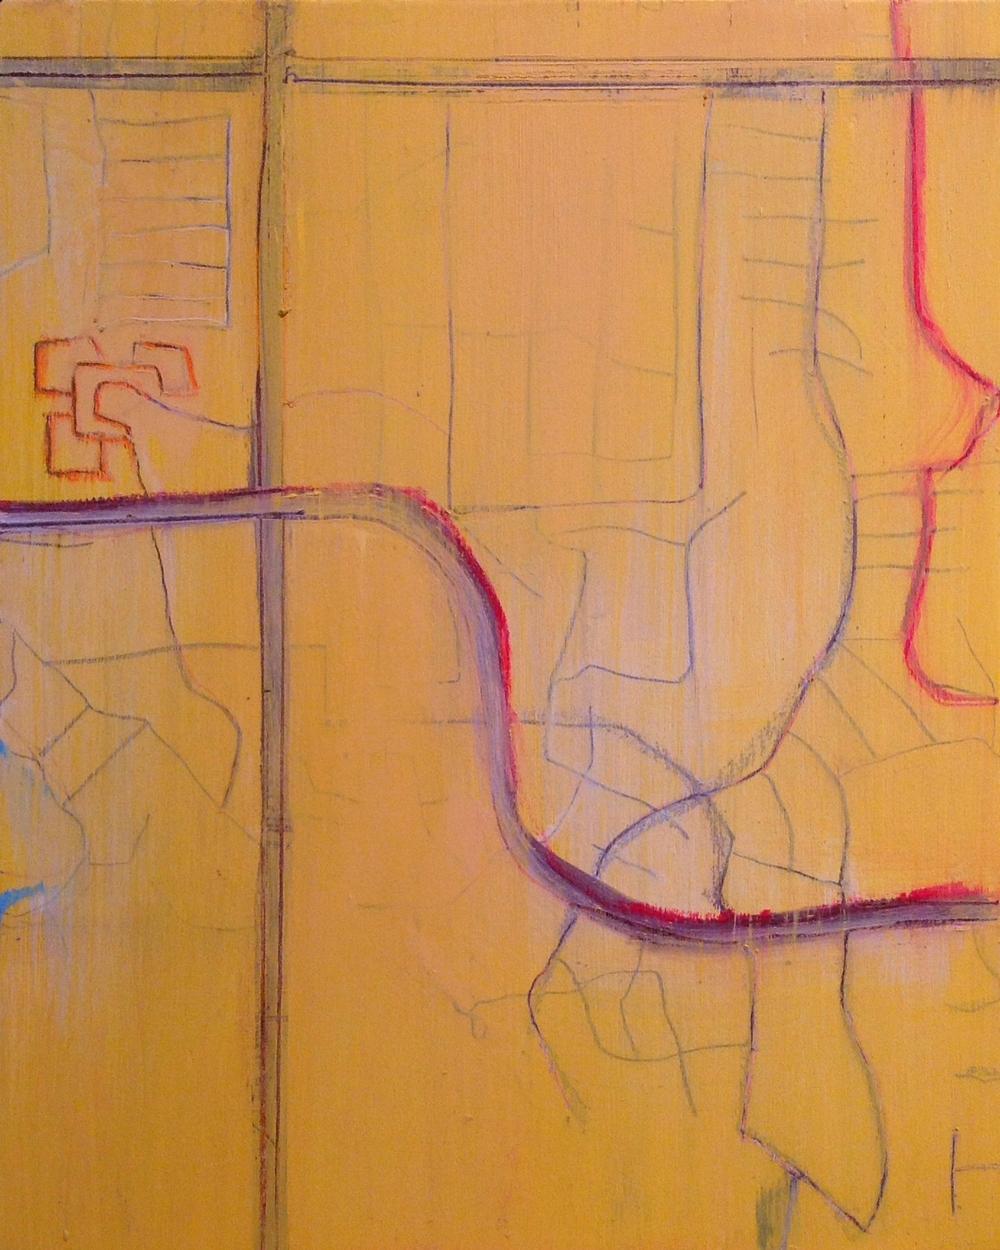 Artmap Section #30